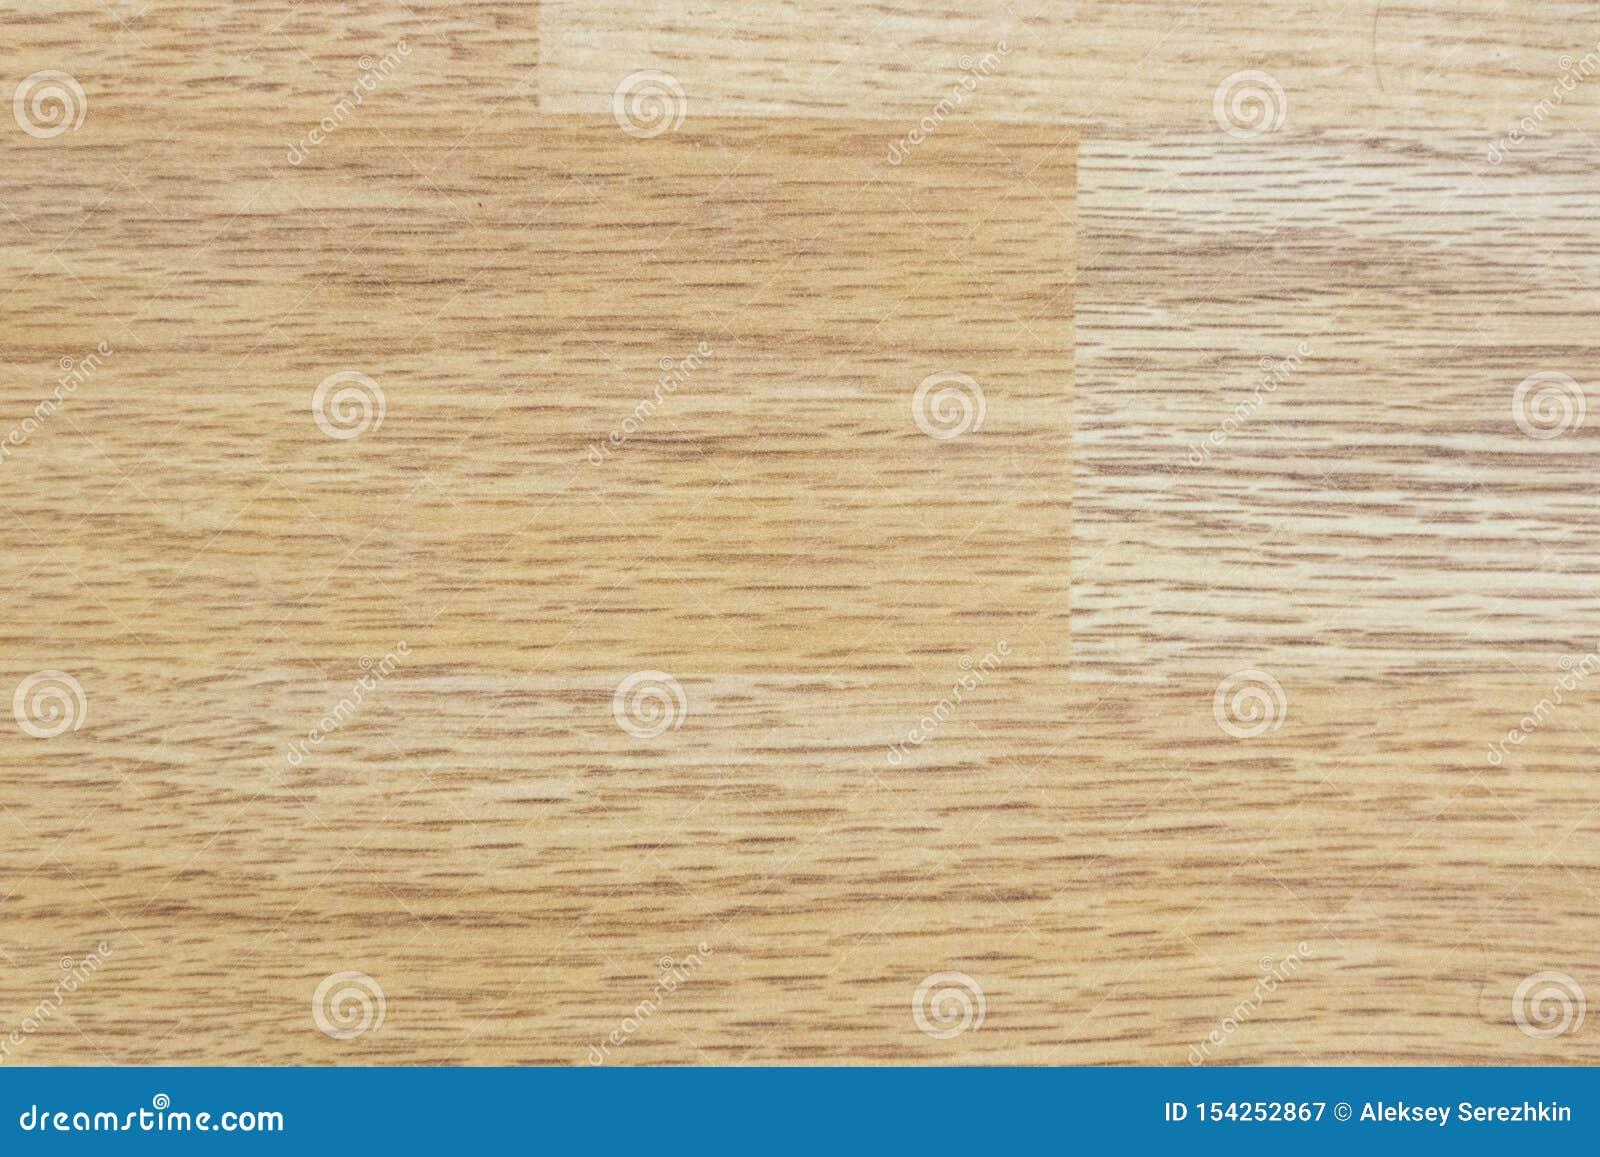 Grunge drewna wzoru tekstury t?o, drewniana parkietowa t?o tekstura